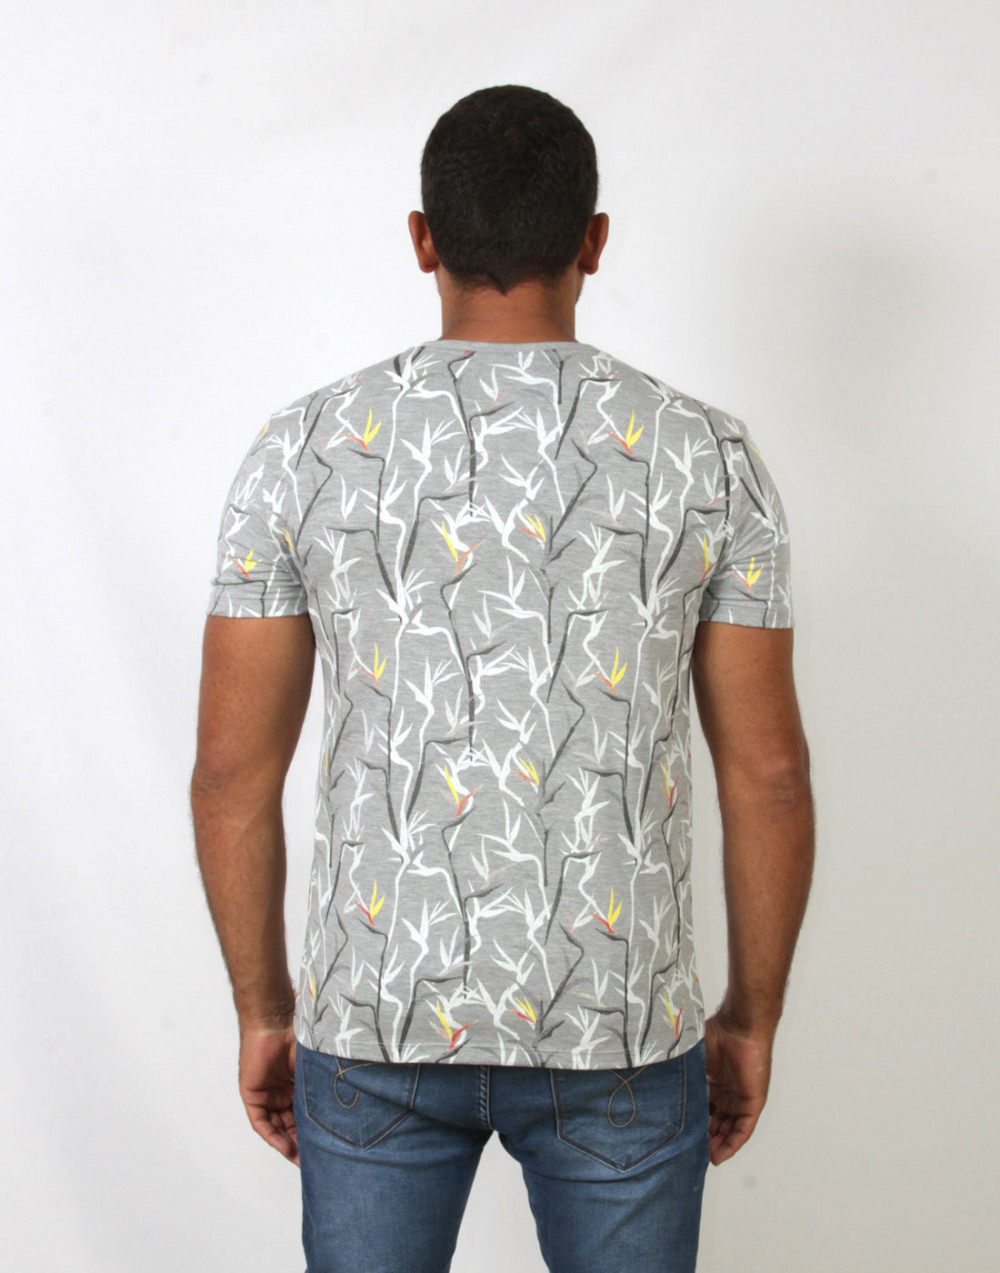 Camiseta Gola V. Estampada Mescla Sallo